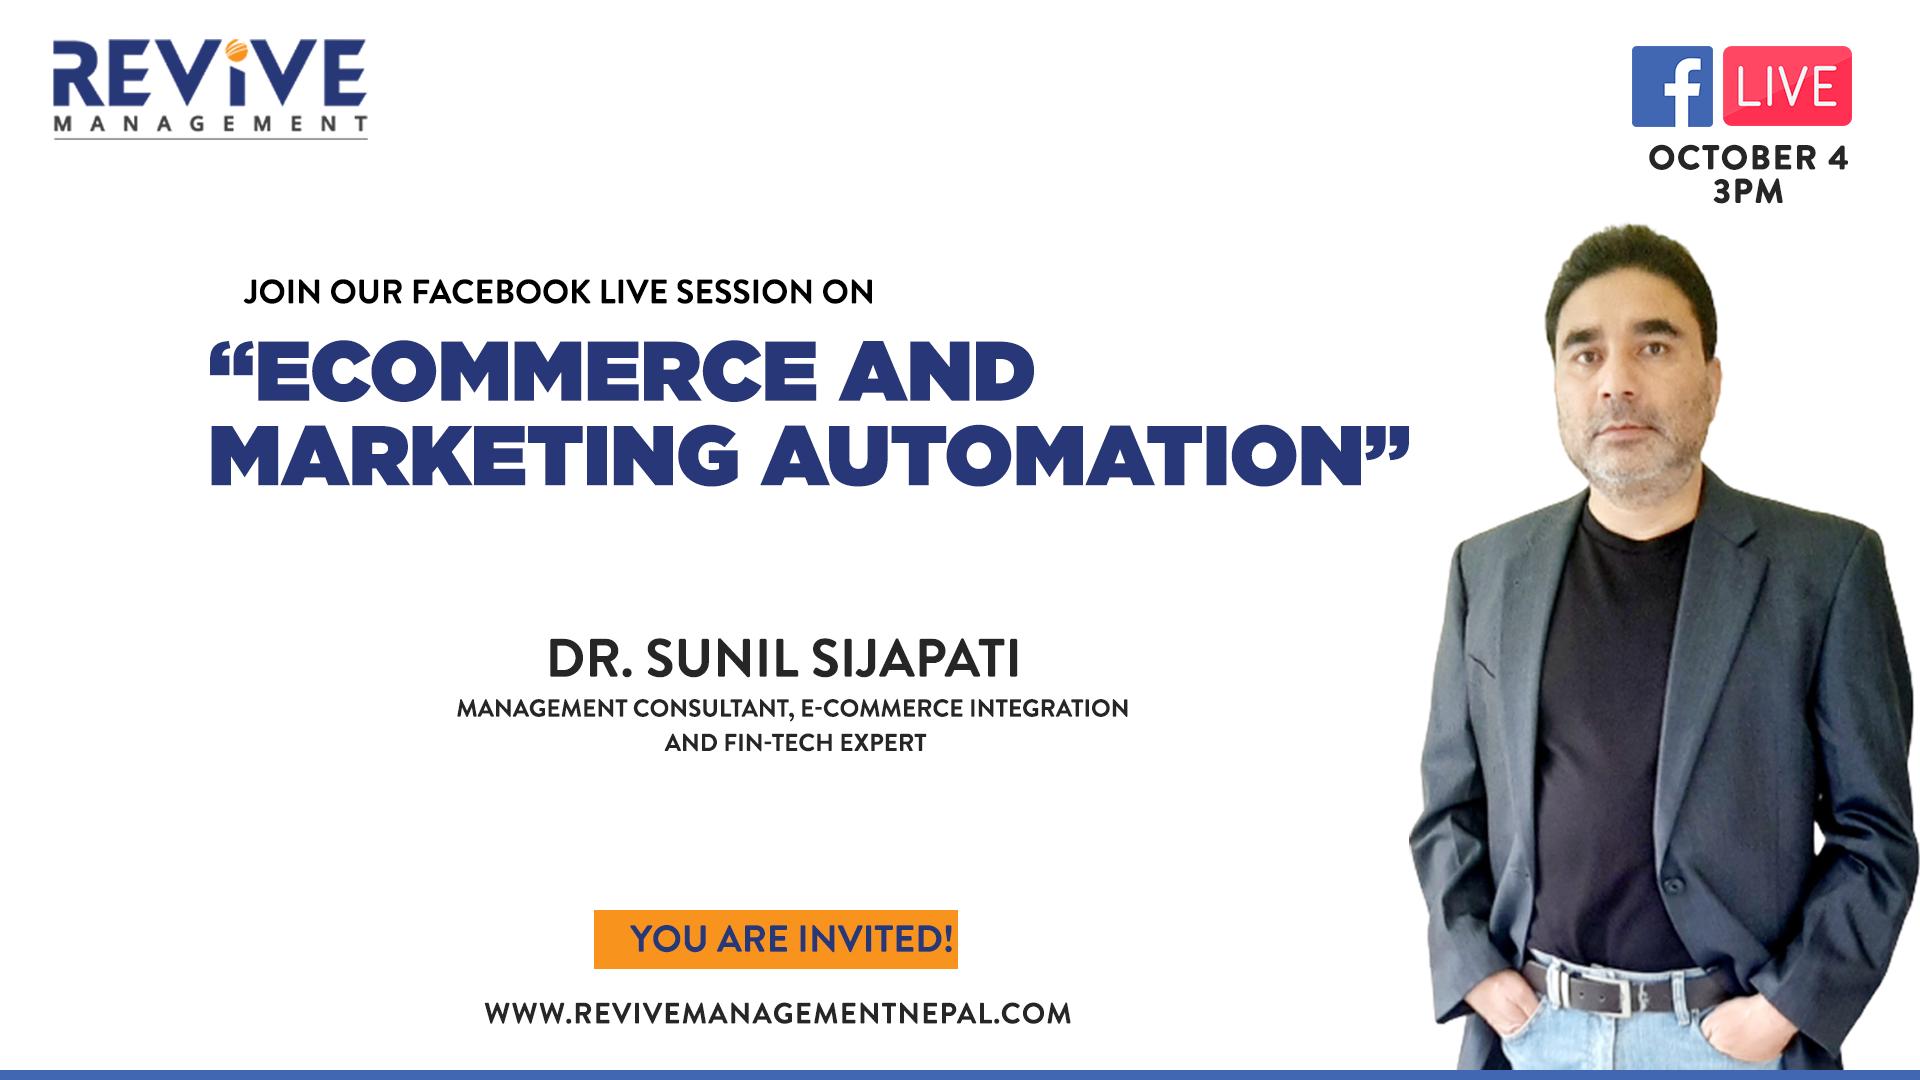 Ecommerce and Marketing Automation